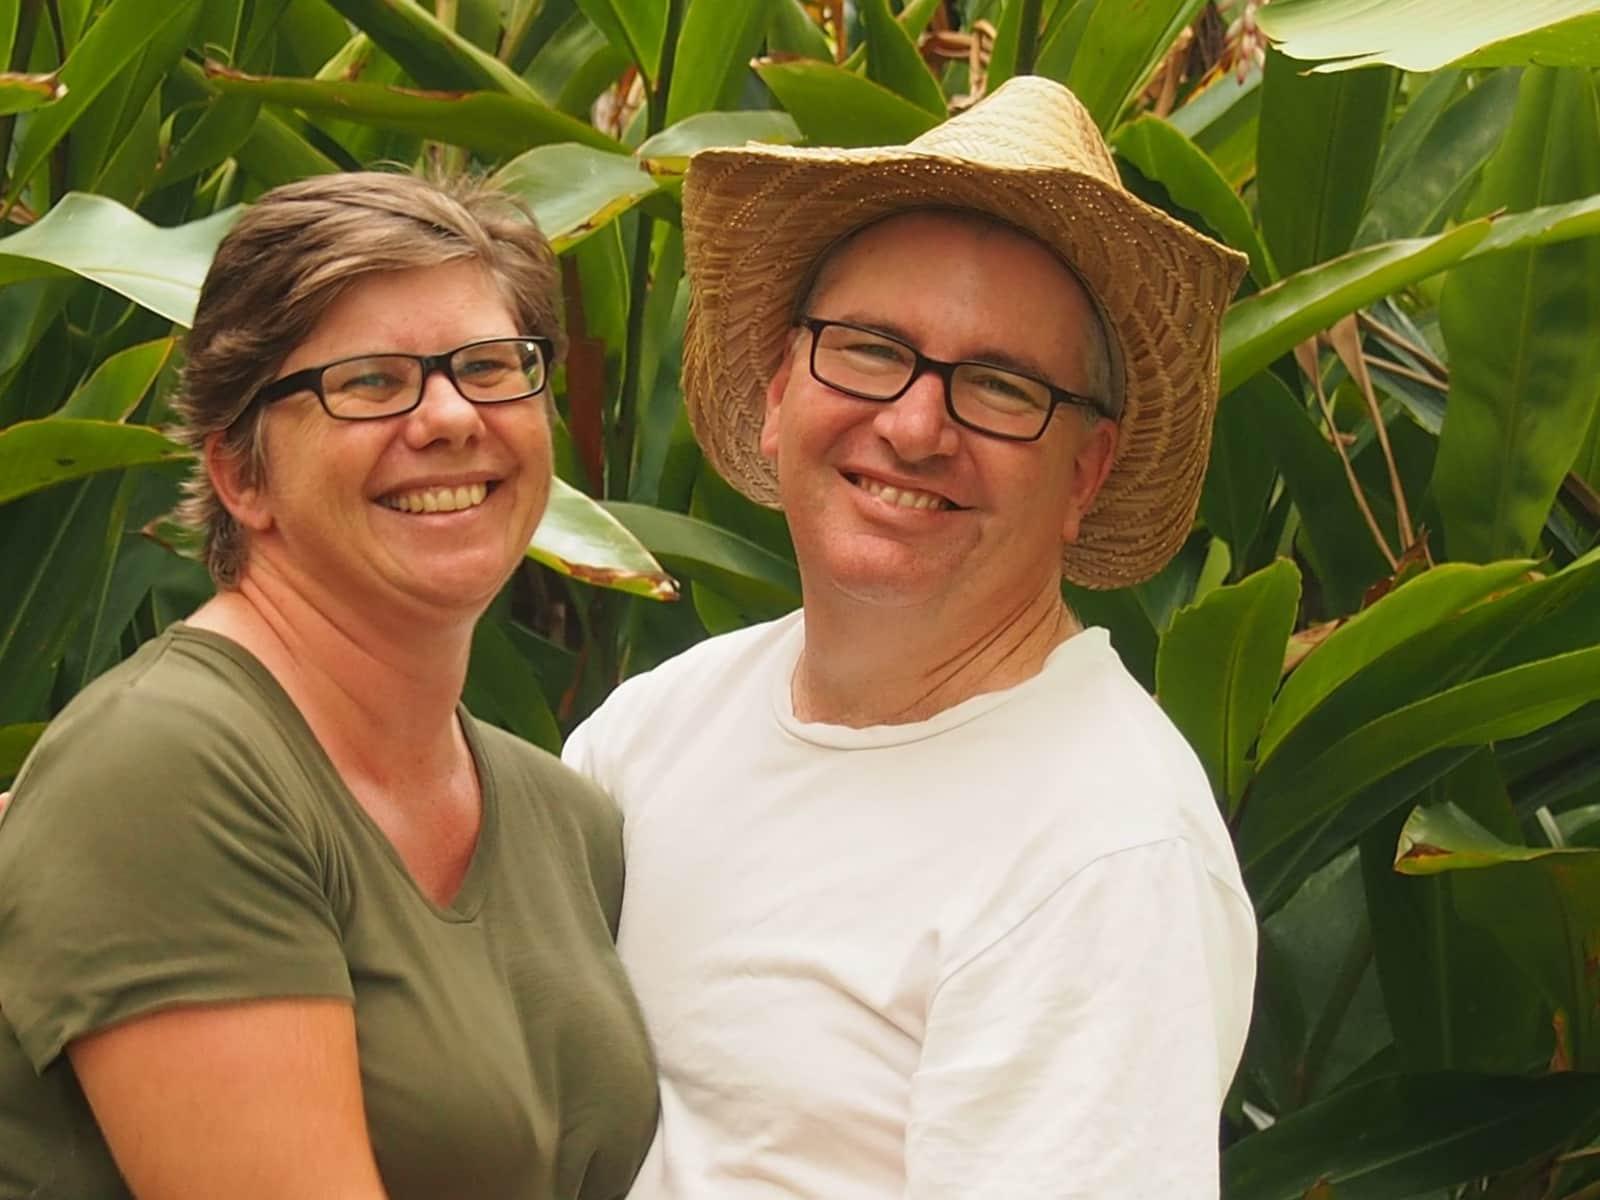 Karla & Stephen from Hobart, Tasmania, Australia